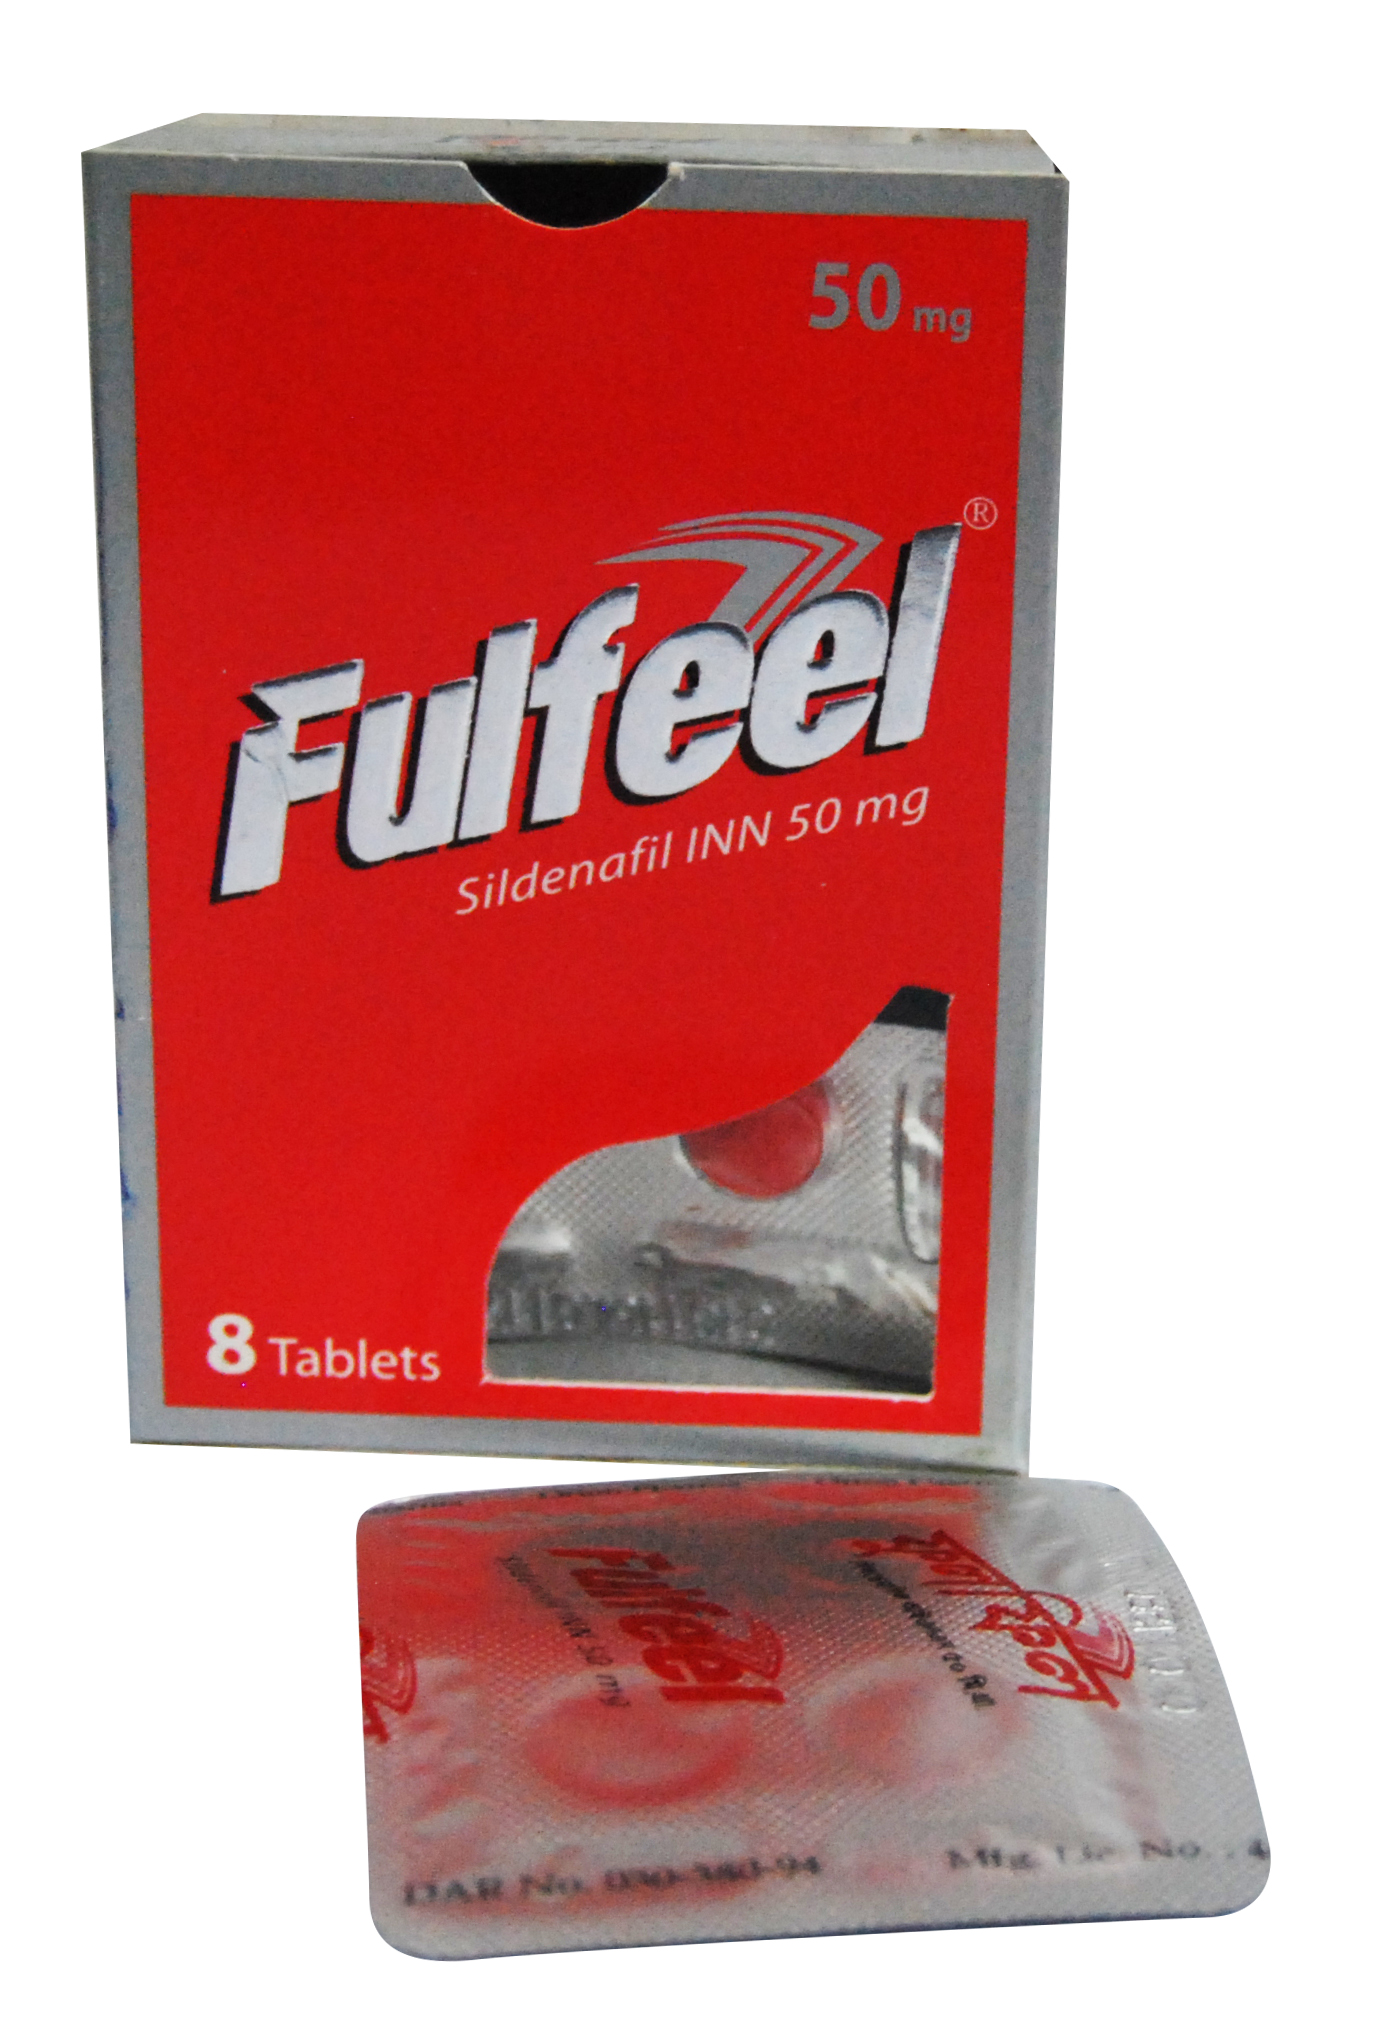 Fulfeel